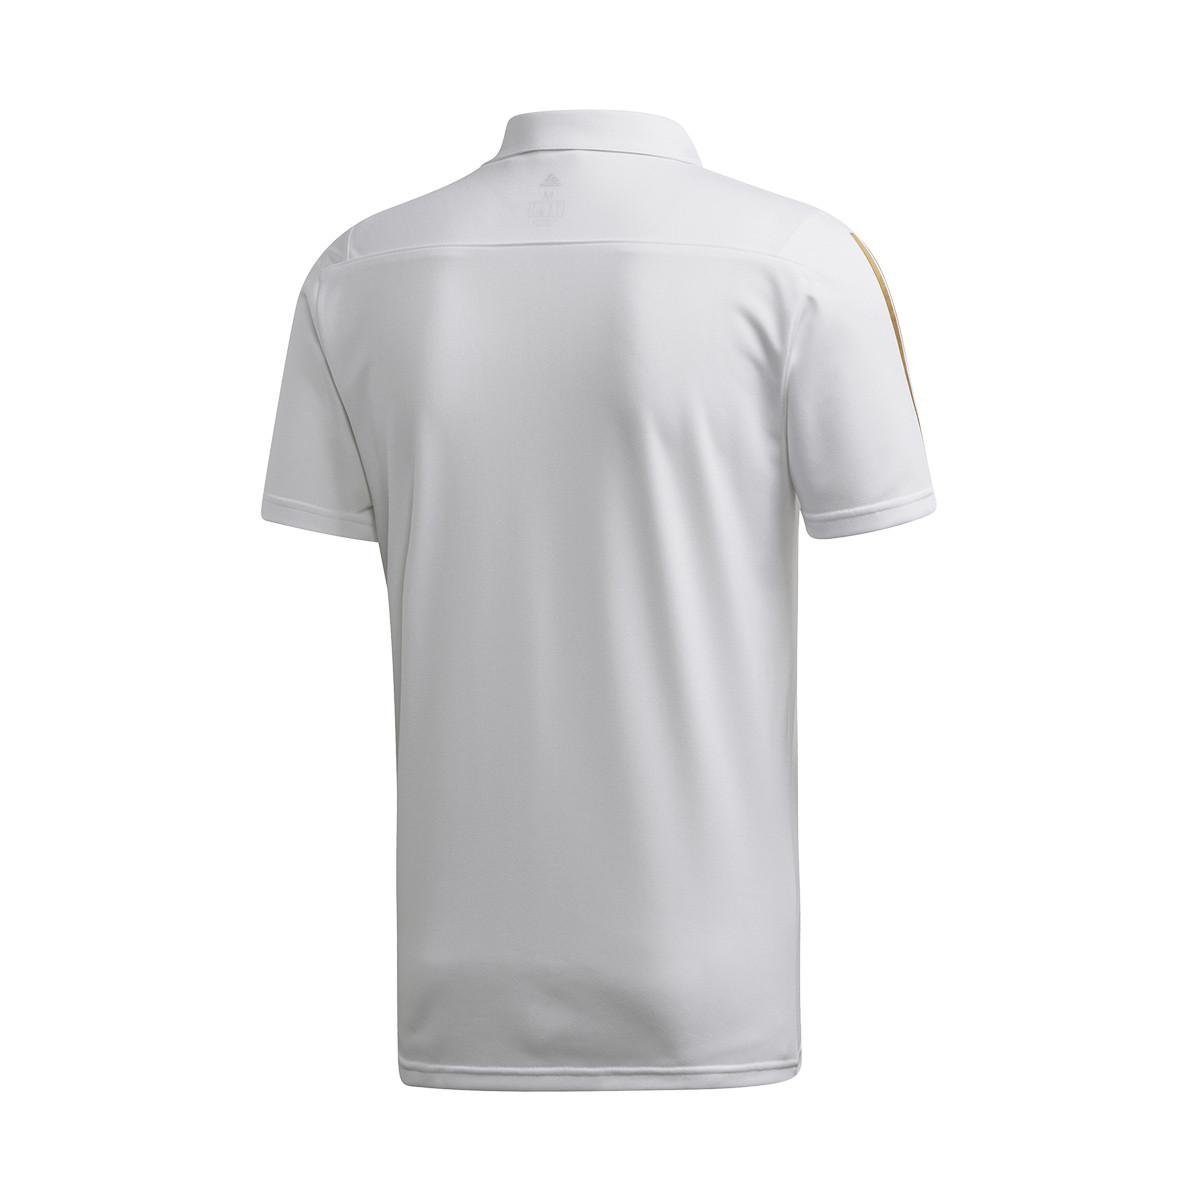 newest c00b6 9149b Polo Real Madrid 2019-2020 White-Dark football gold